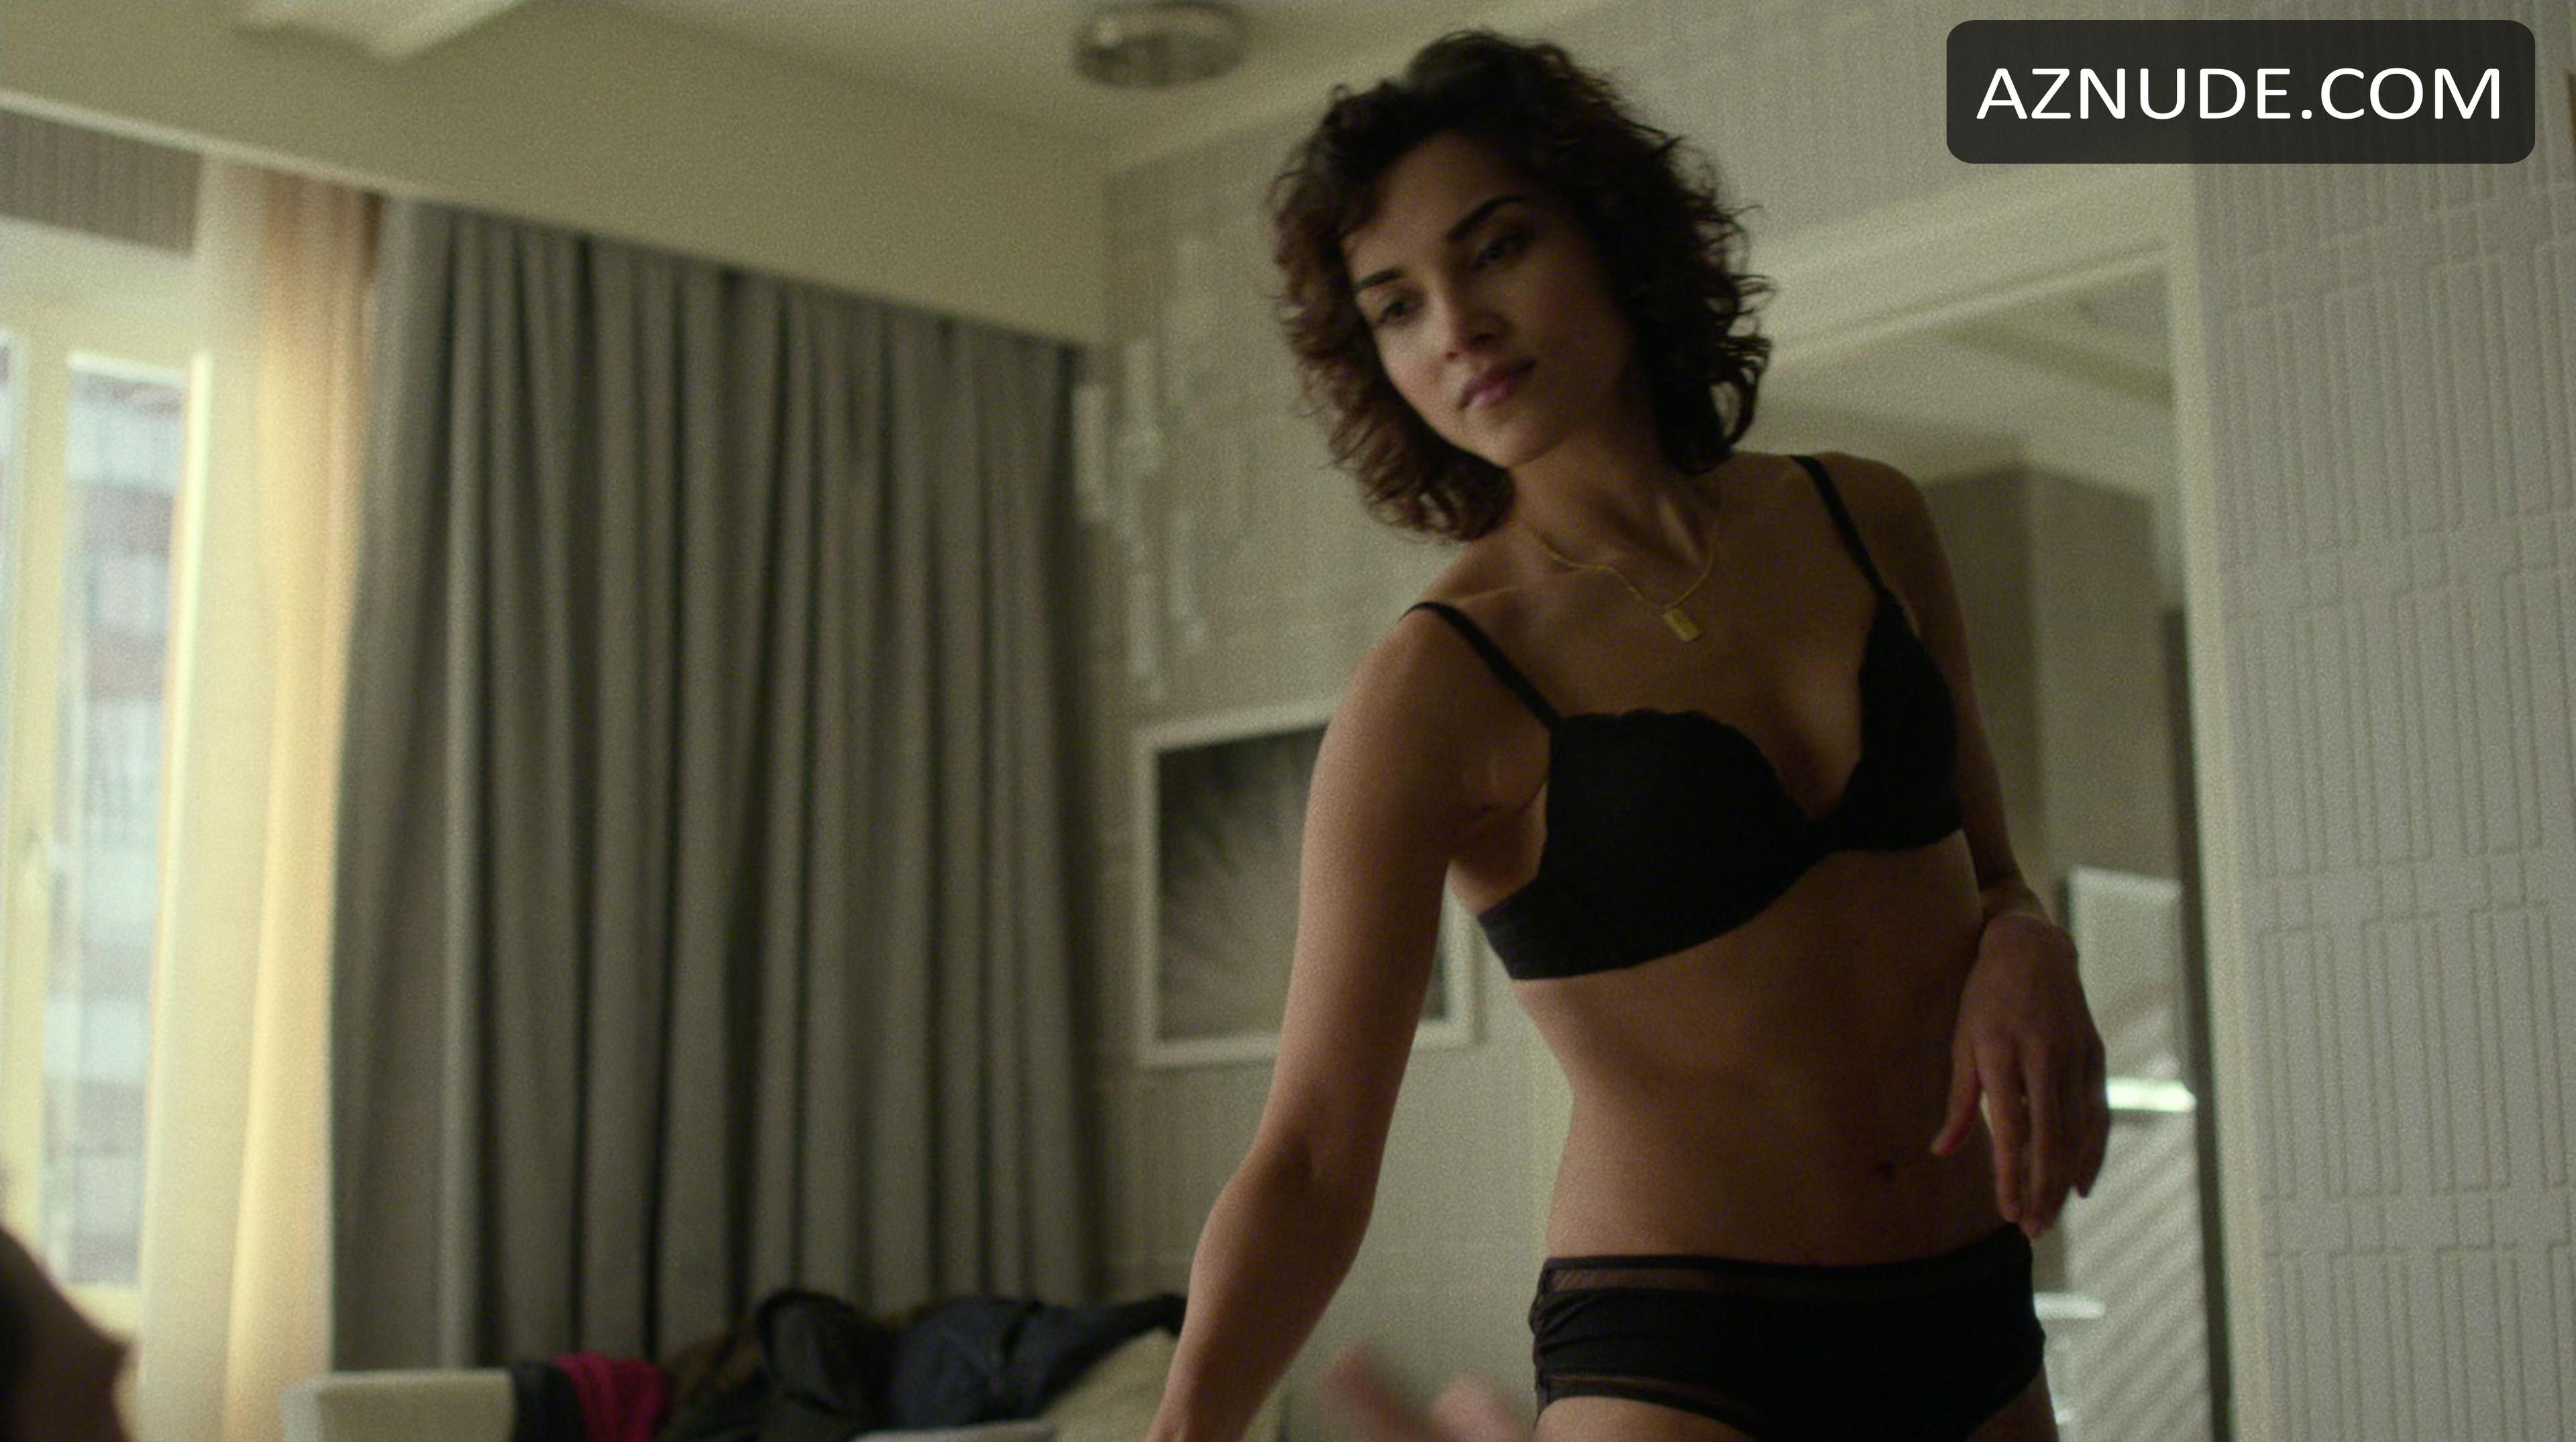 Amber Rose Porn Movie amber rose revah nude - aznude